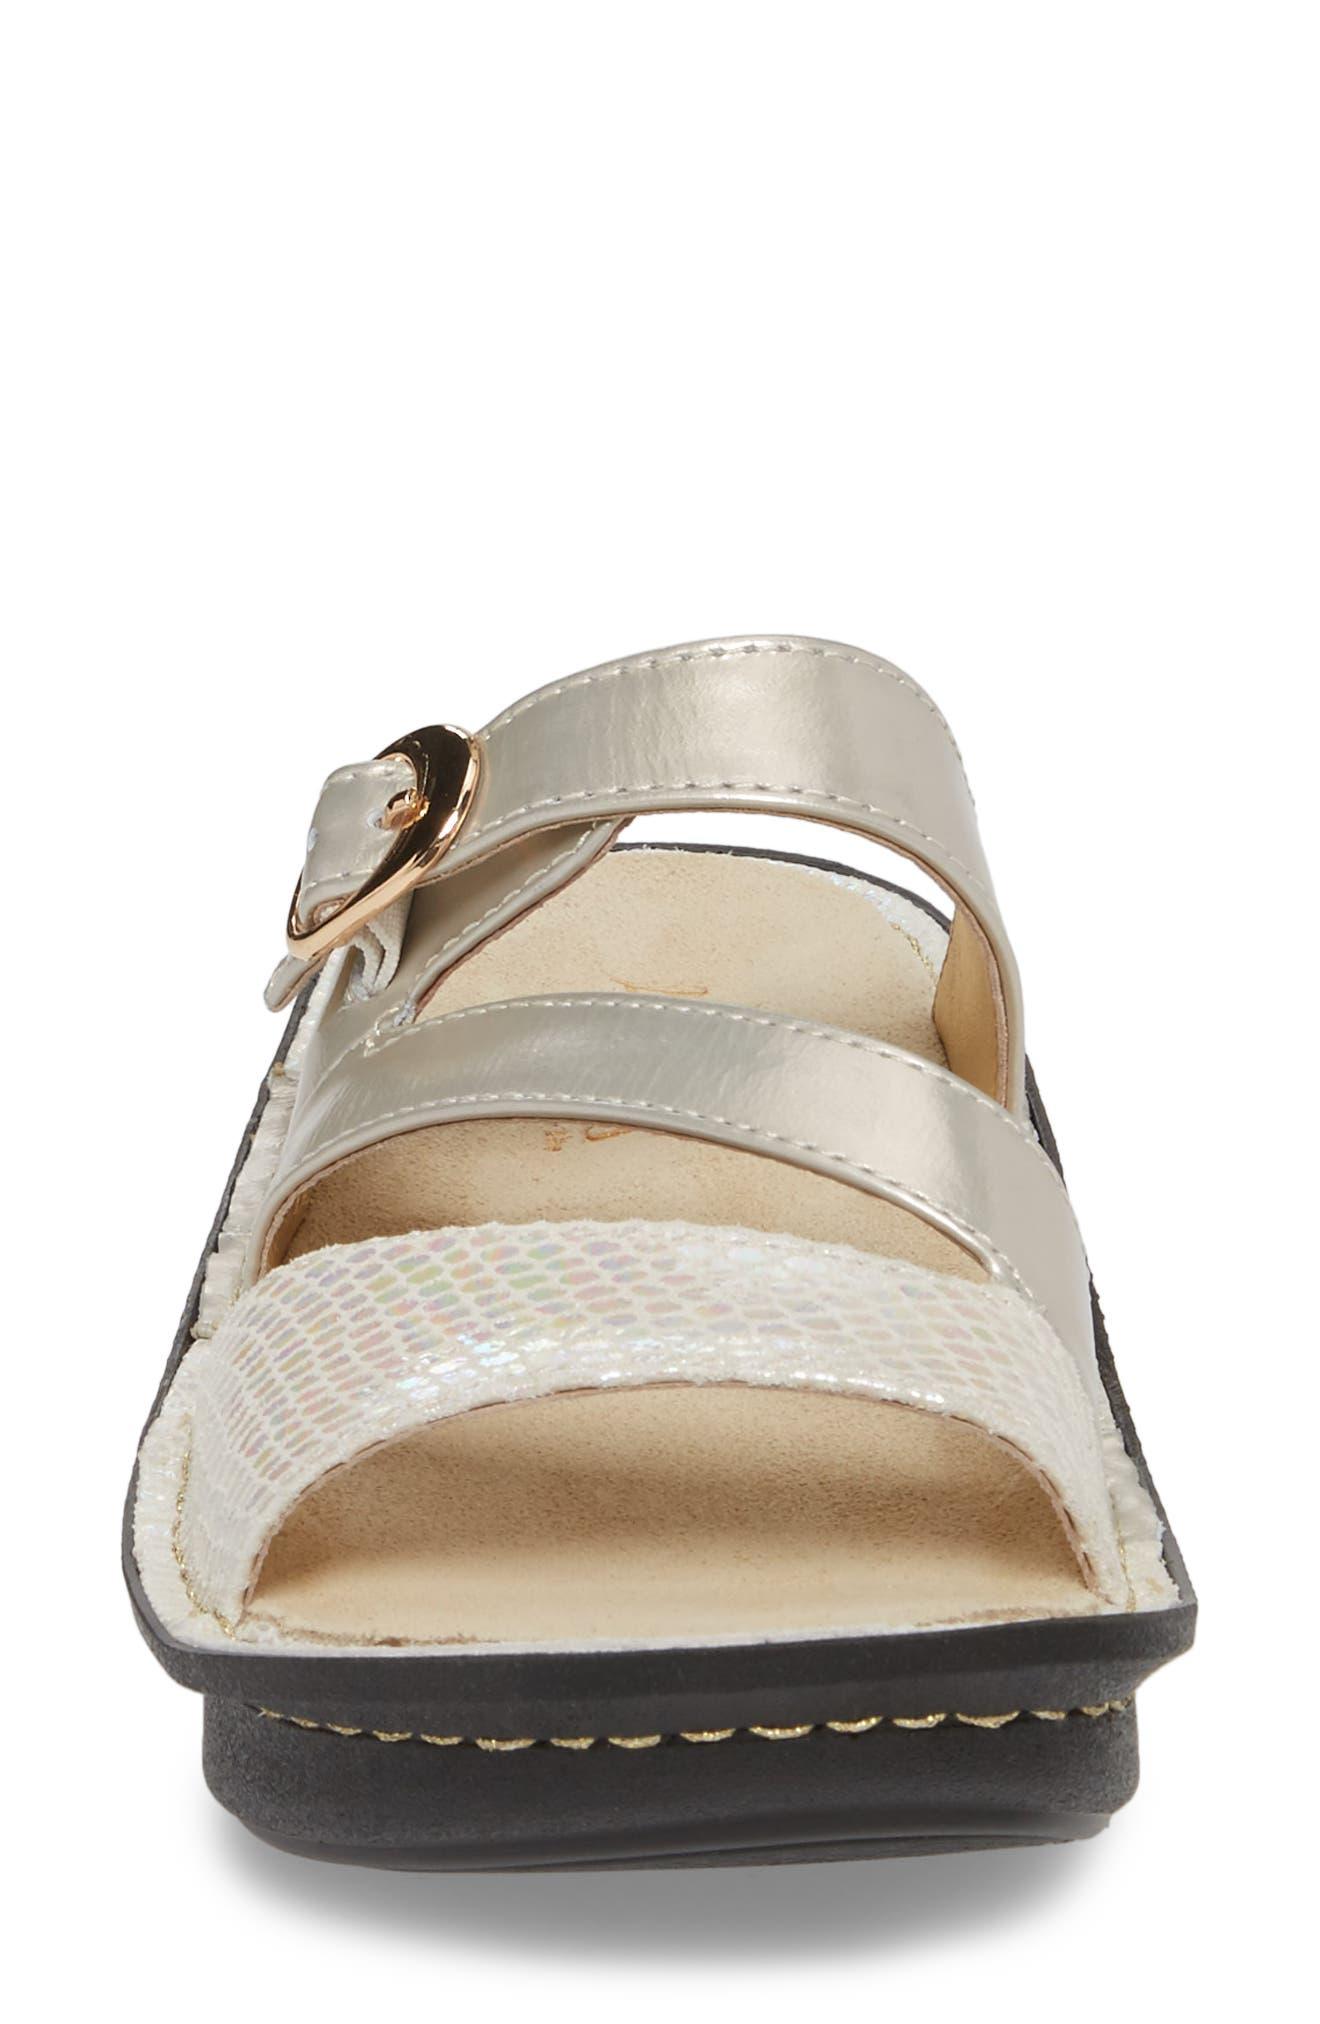 ALEGRIA, 'Colette' Platform Sandal, Alternate thumbnail 4, color, OPFULLY LEATHER